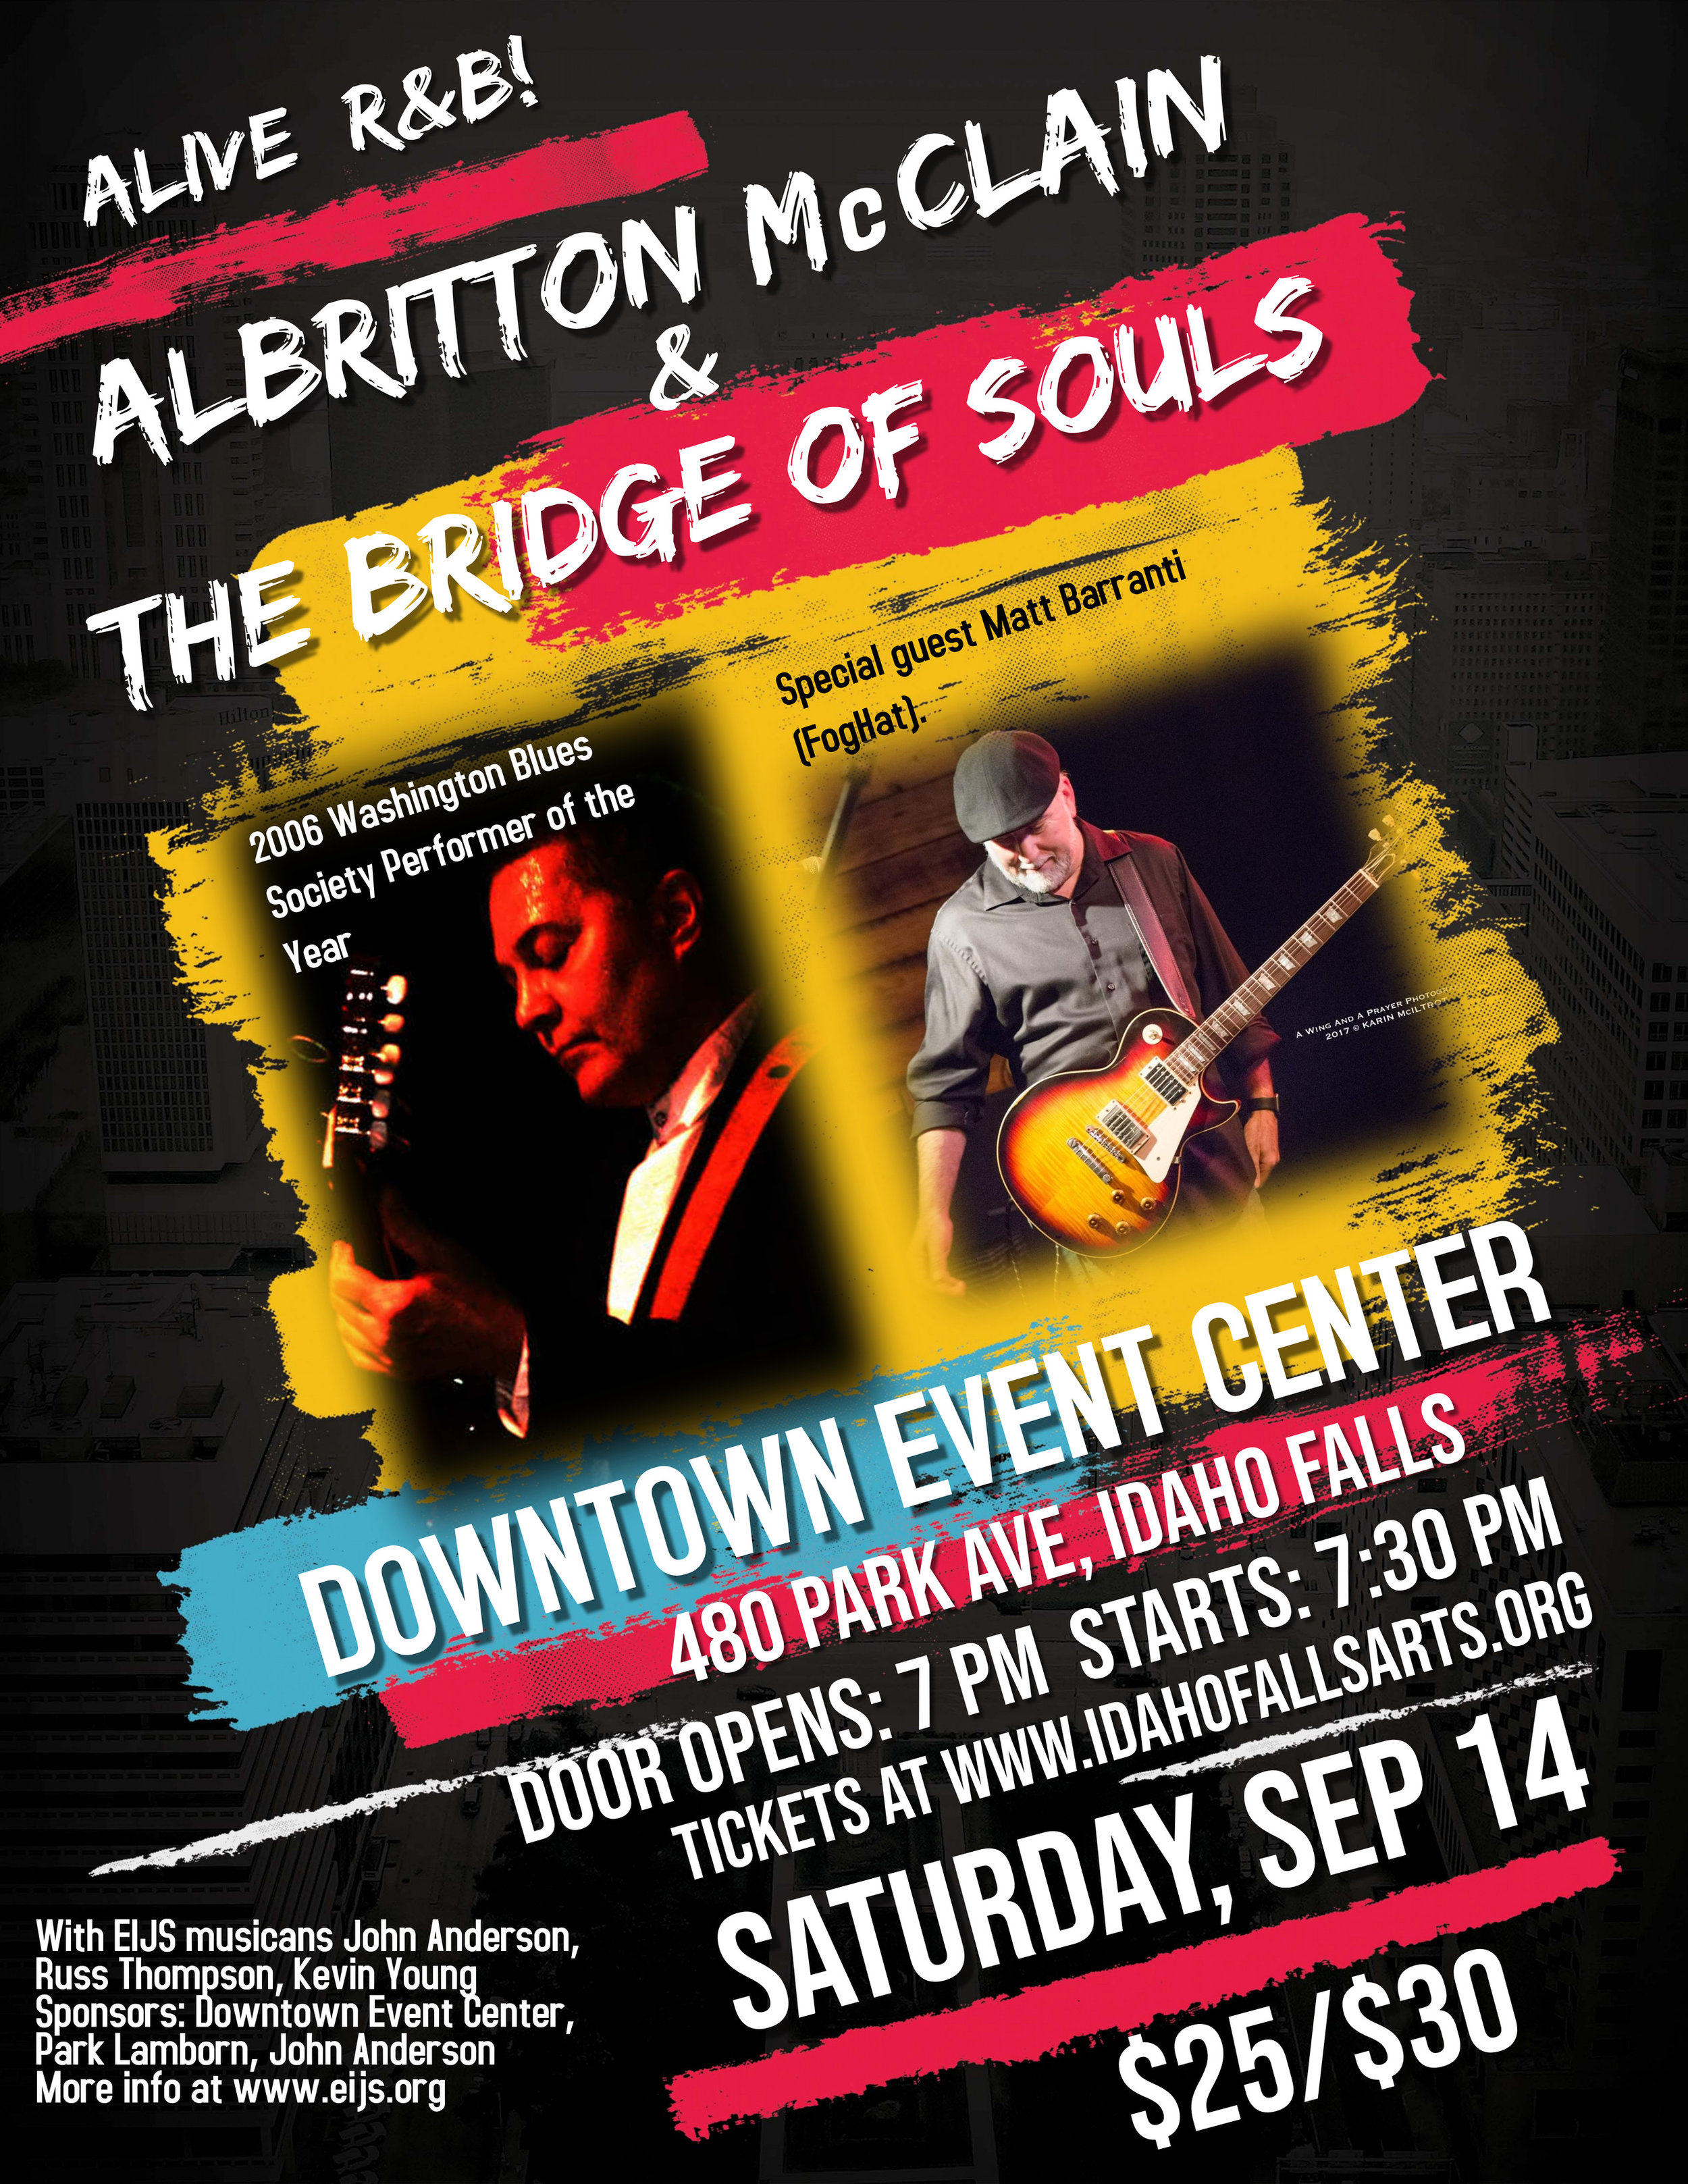 Albritton McClain  The Bridge of Souls-Rev 2.jpg